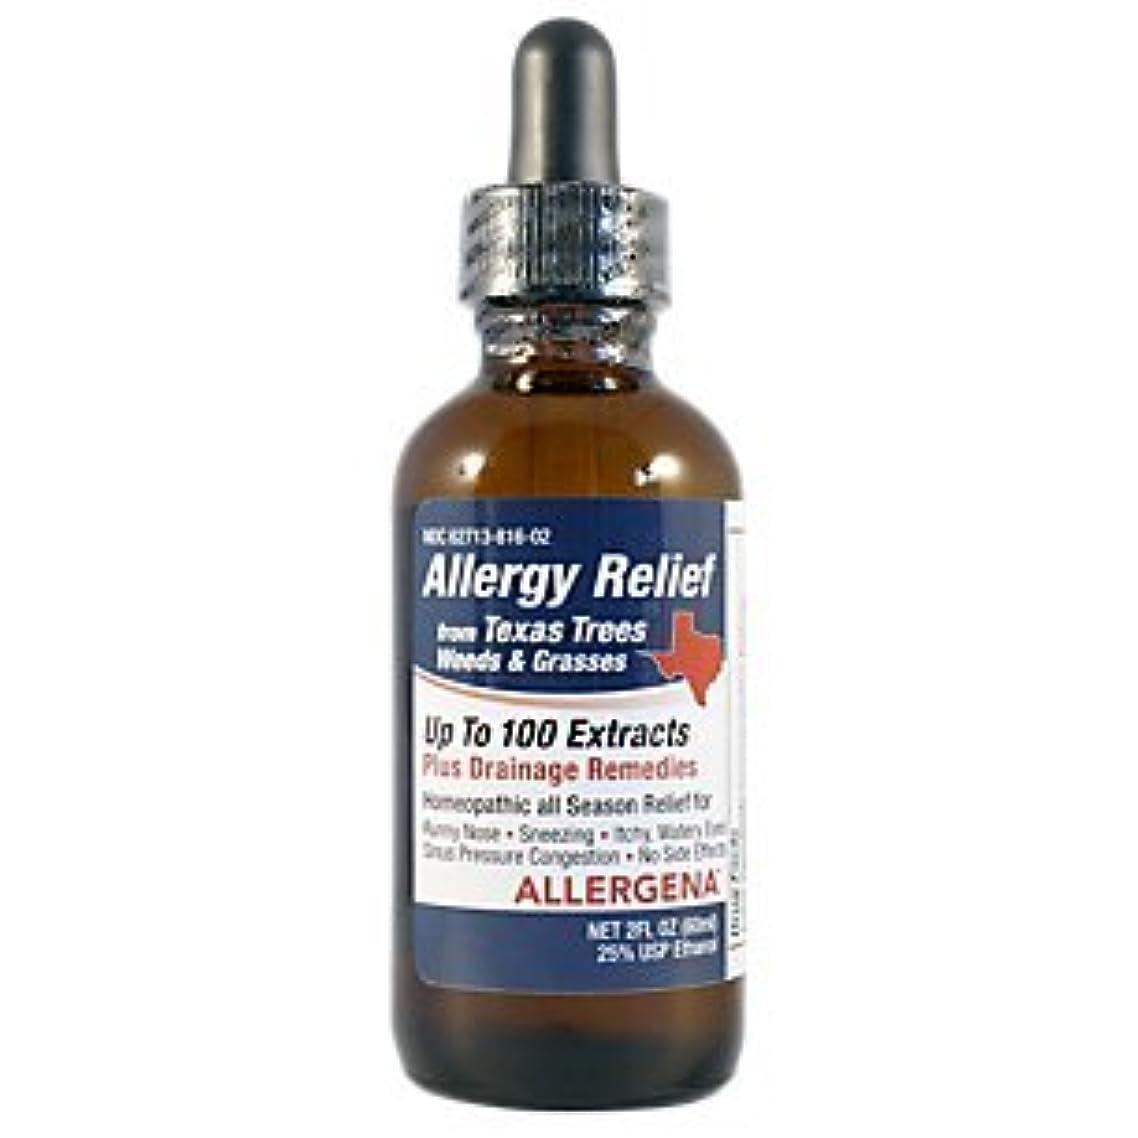 Allergena - Texas Trees Liquid - 2 Ounce